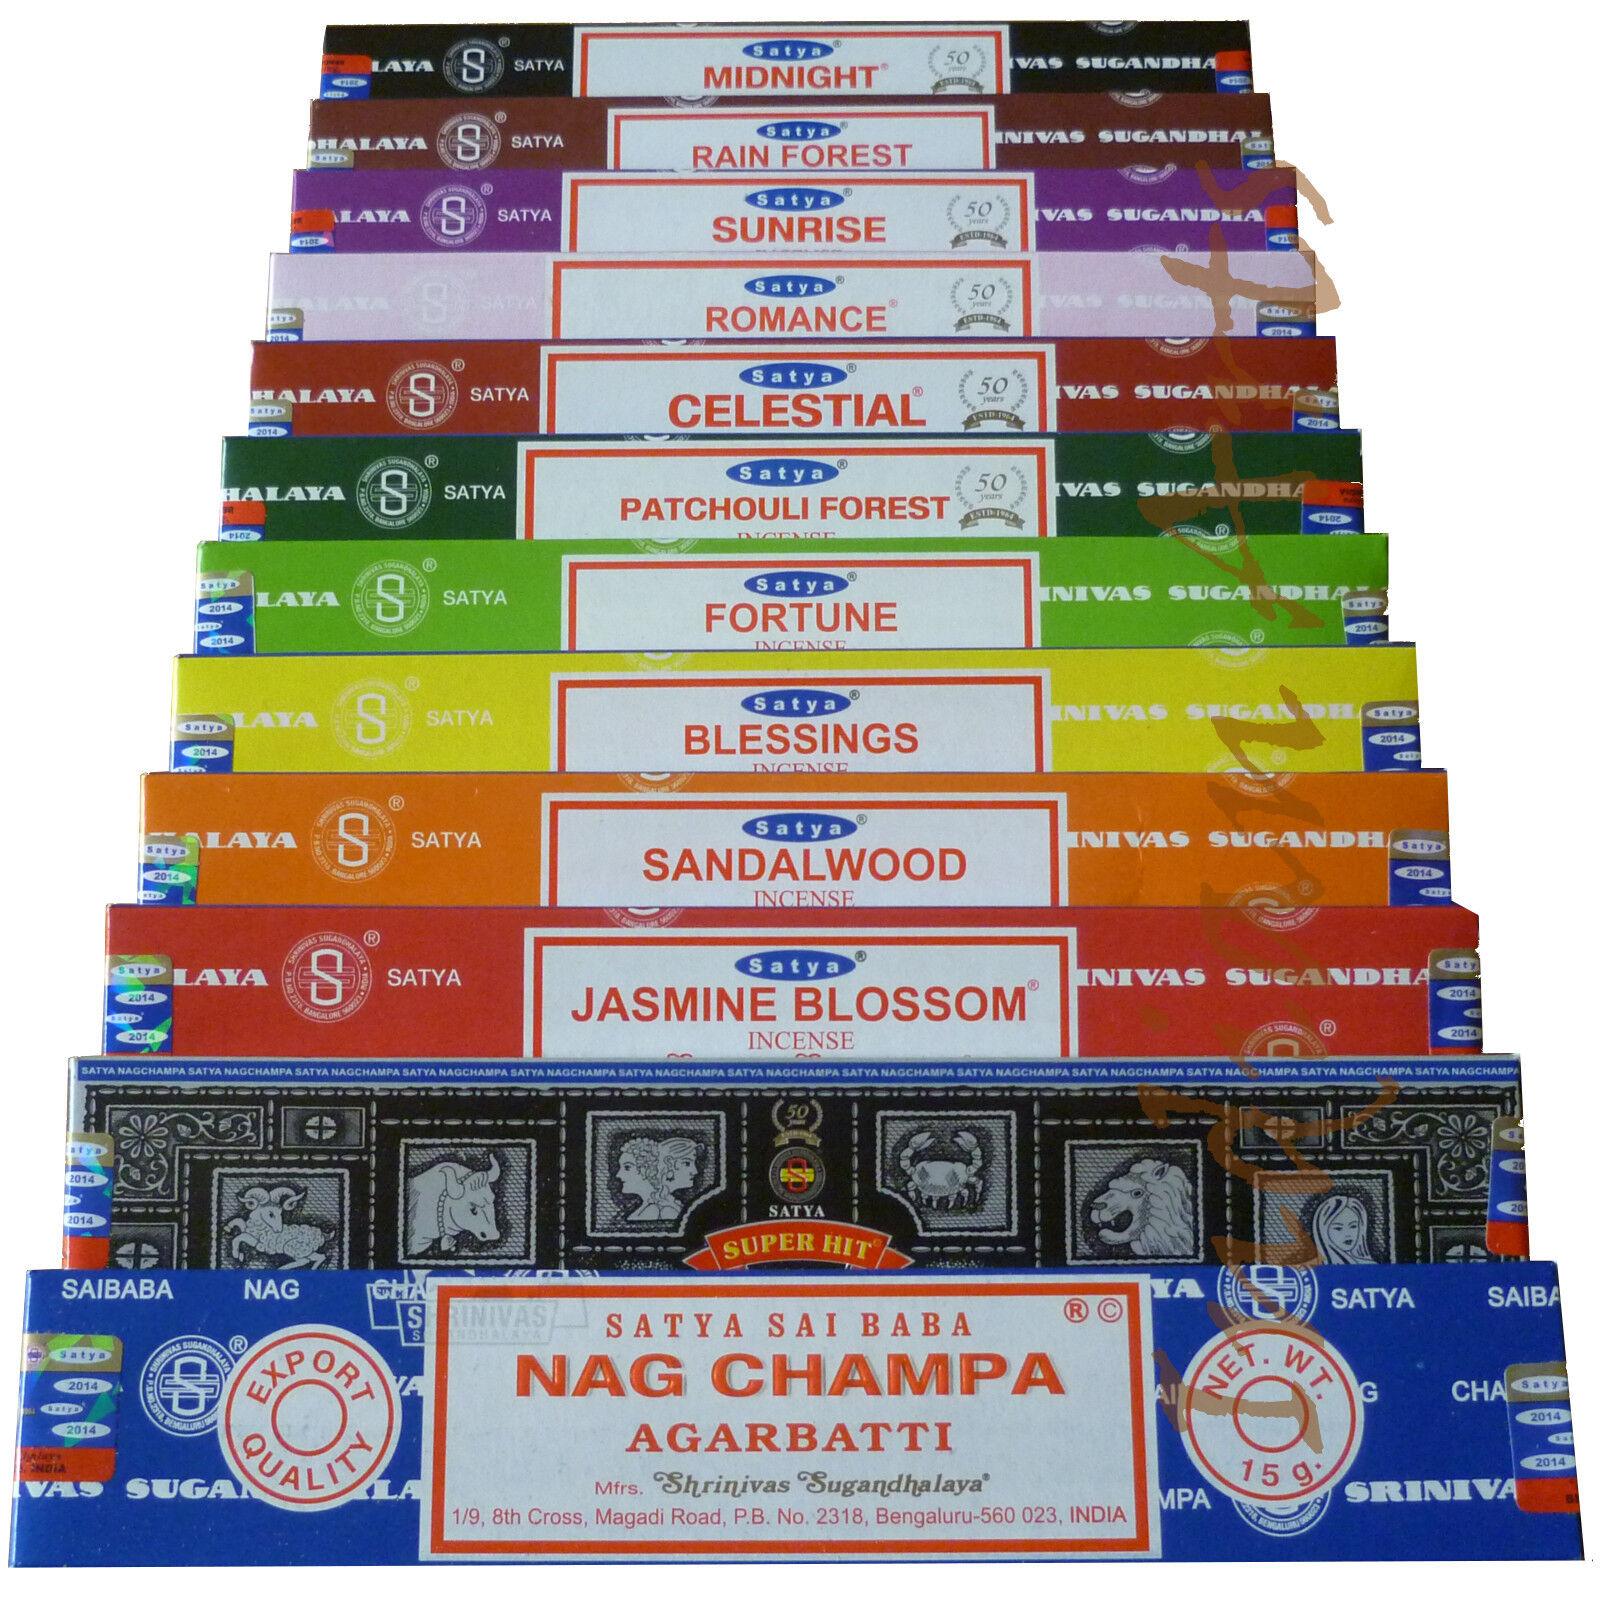 Satya Genuine Nag Champa Incense Sticks Joss 15g From 0.99p (mixed scents) +